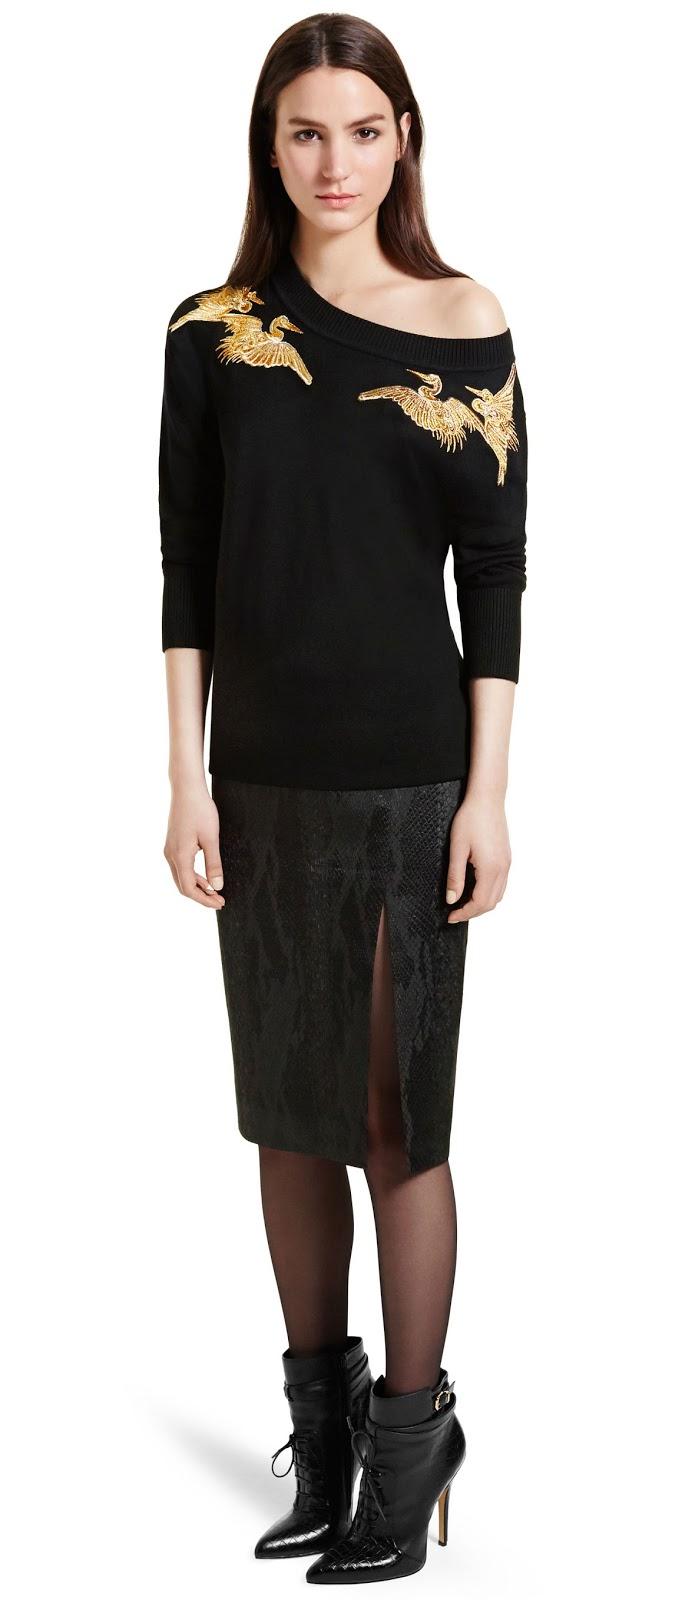 Altuzarra for Target crane swatshirt and jacquard pencil skirt